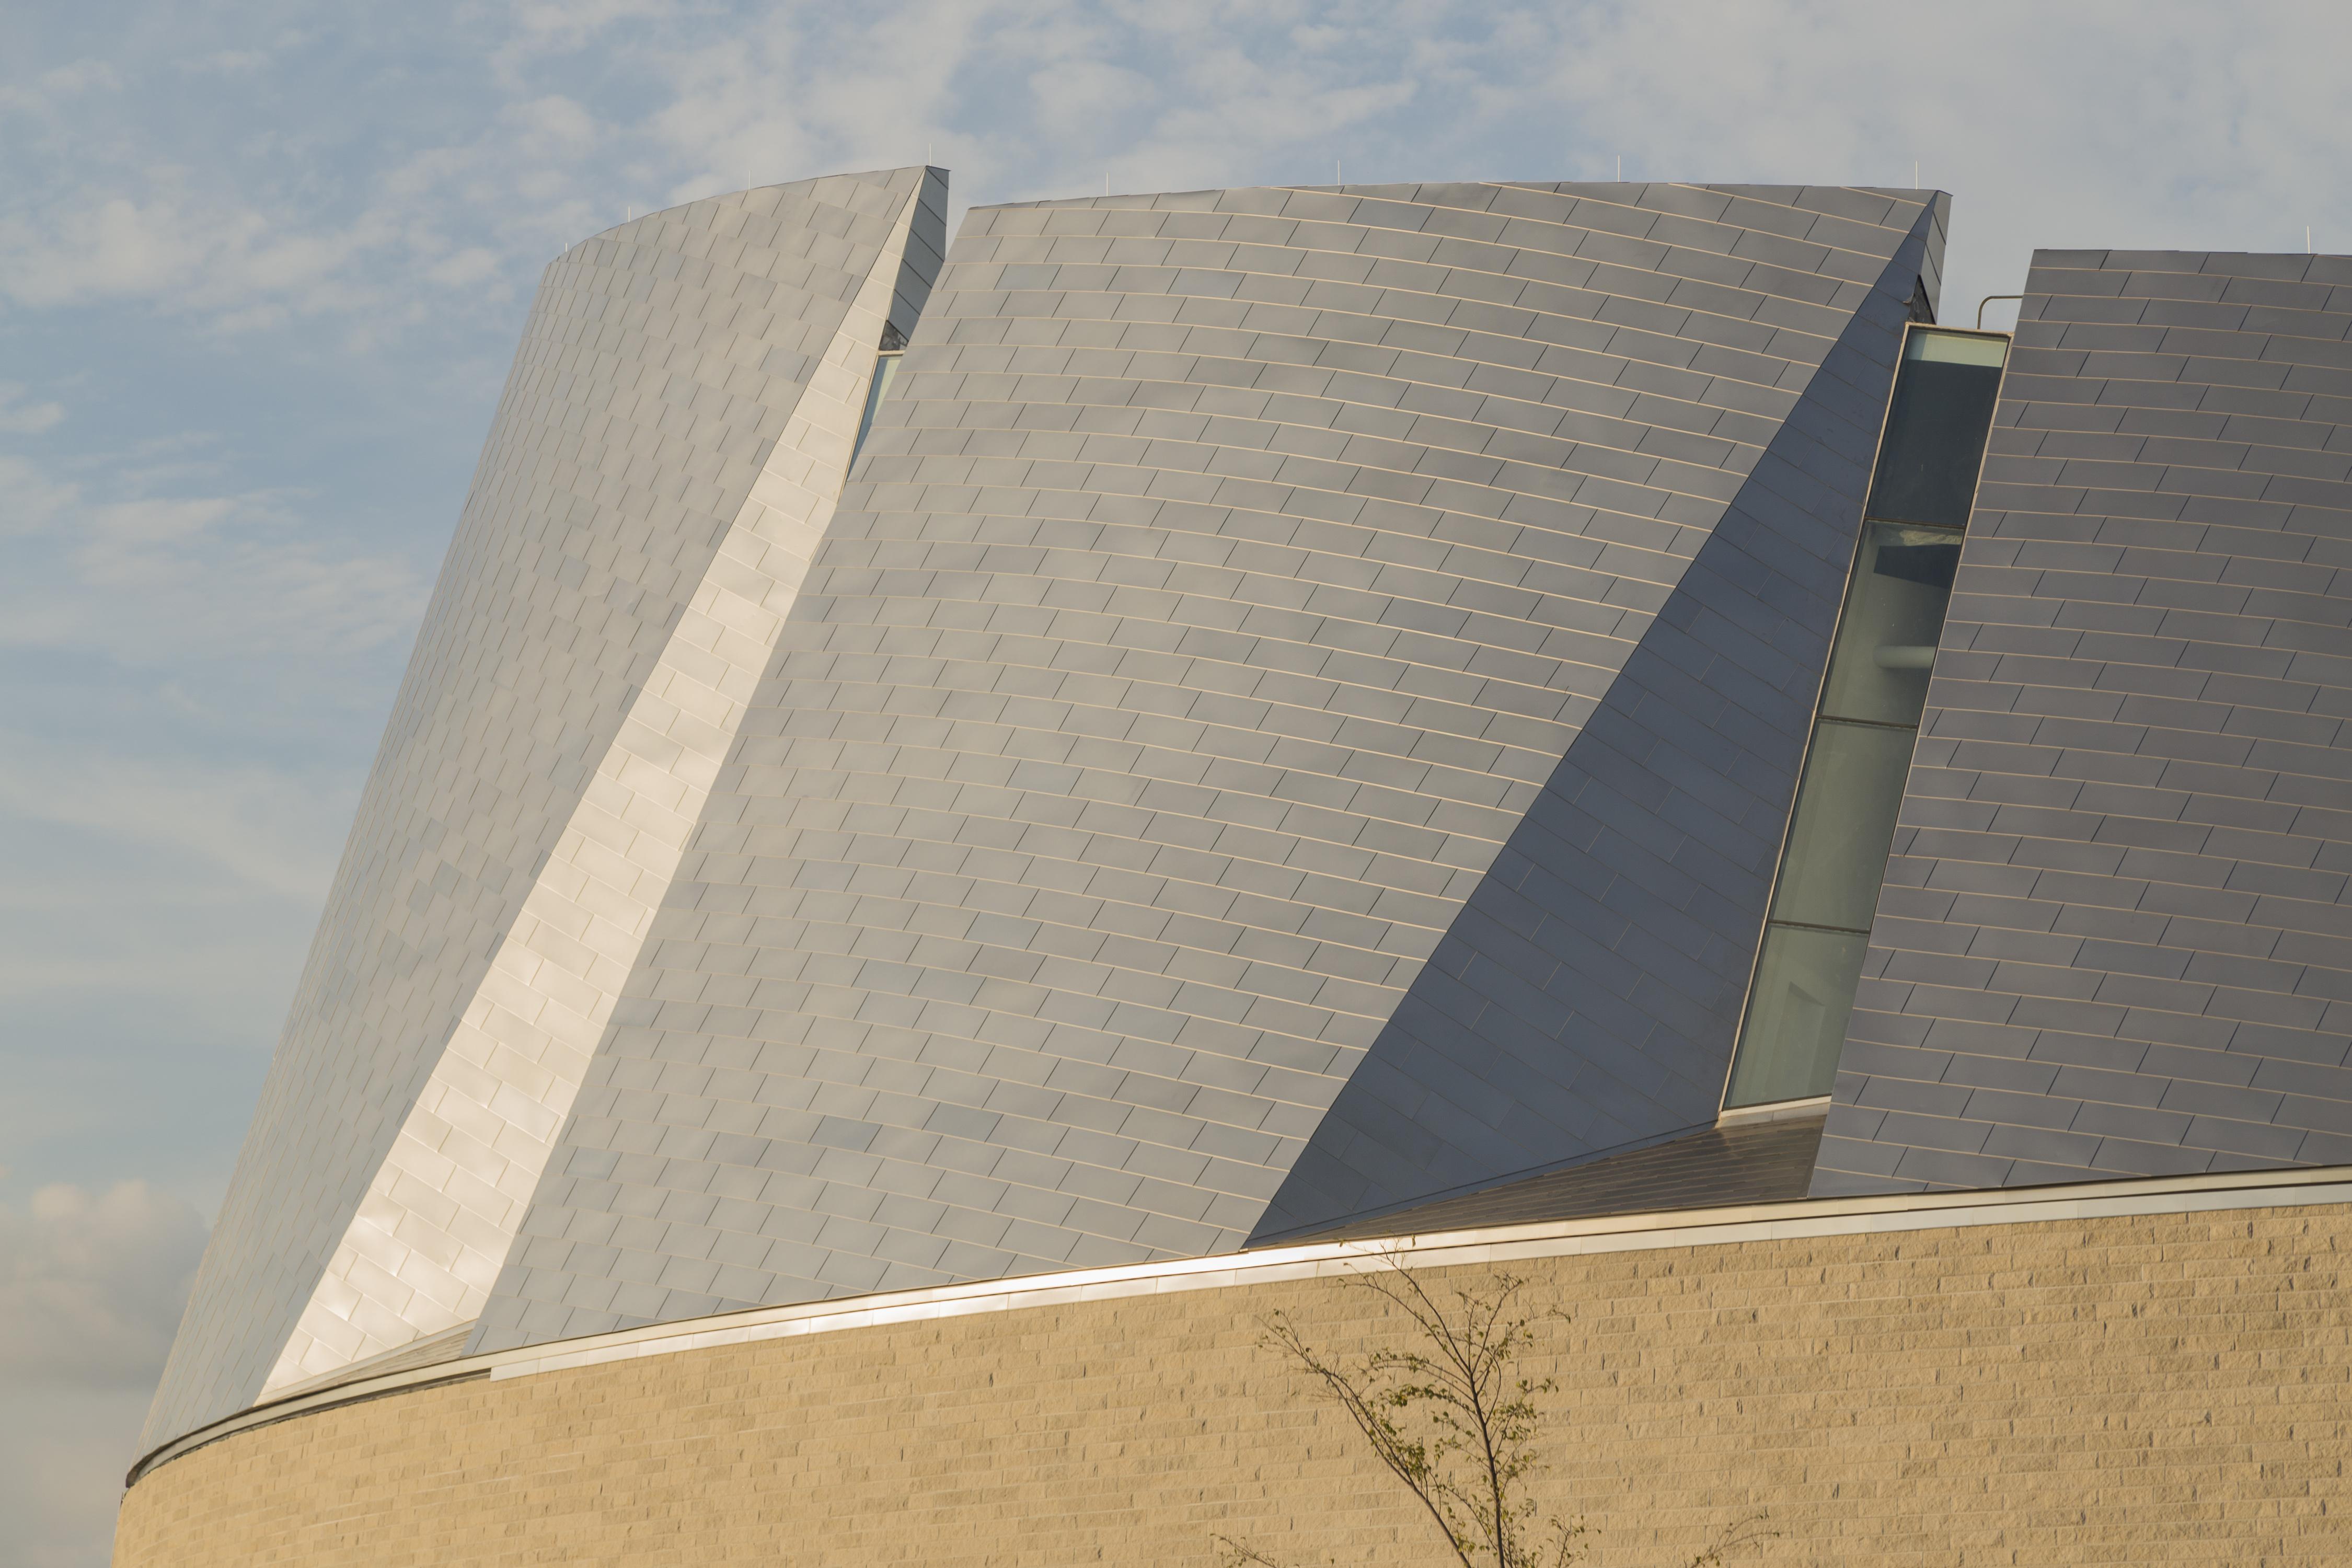 United Methodist Church of the Resurrection in Leawood, Kansas.